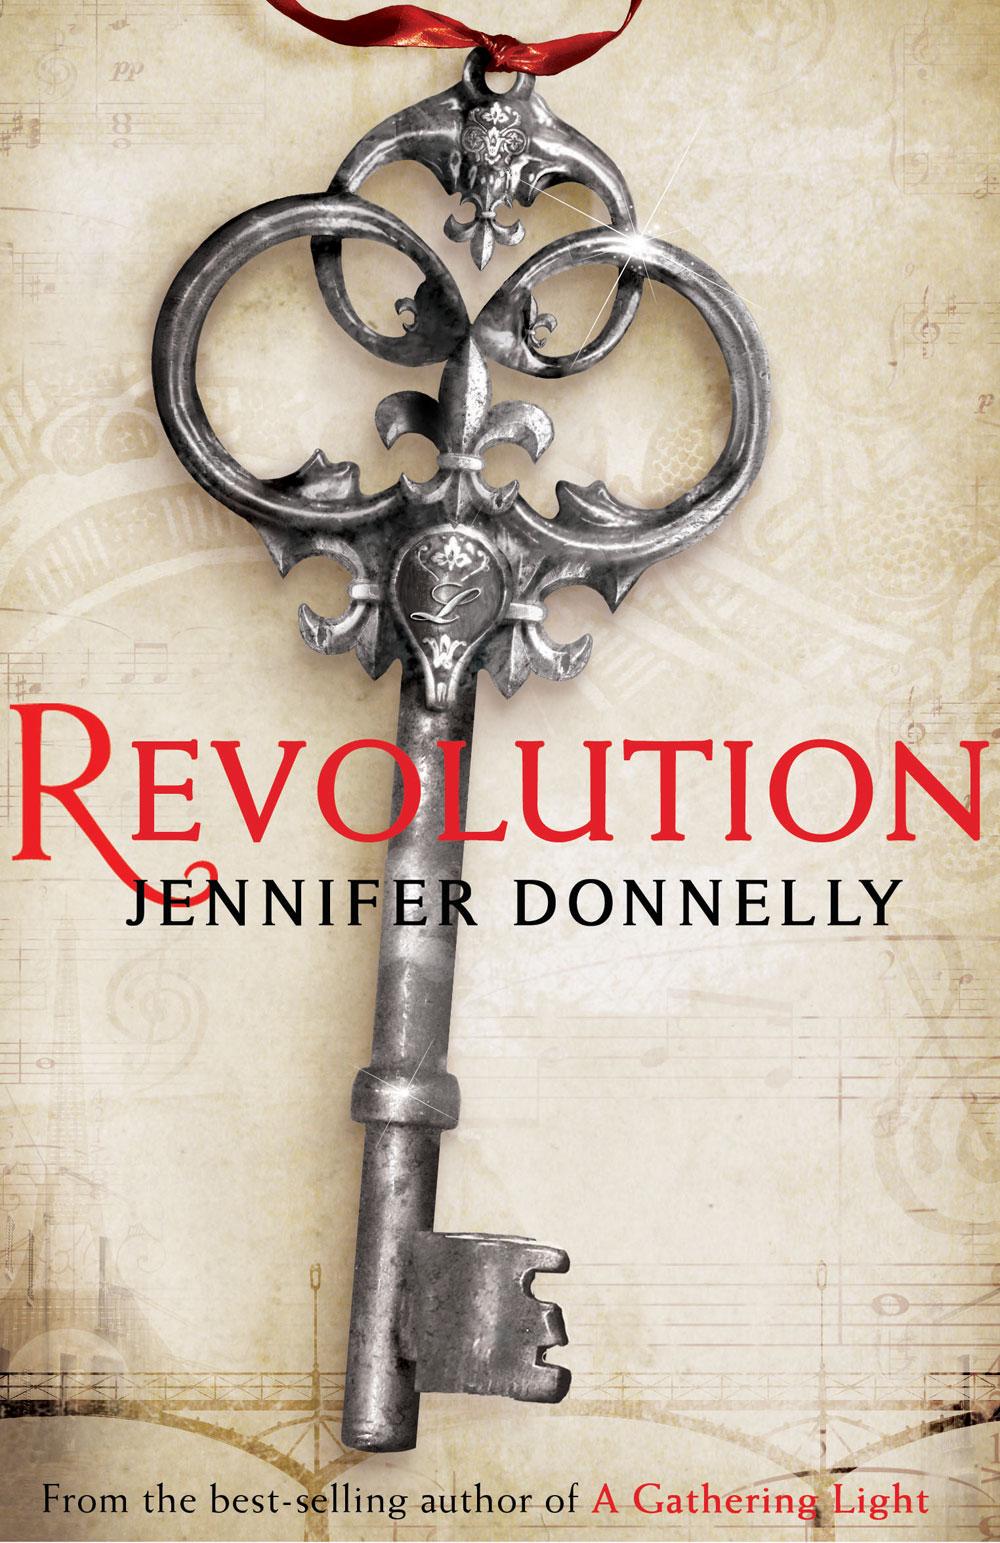 https://i1.wp.com/thebooksmugglers.com/wp-content/uploads/2010/10/Revolution-Cover-Image.jpg